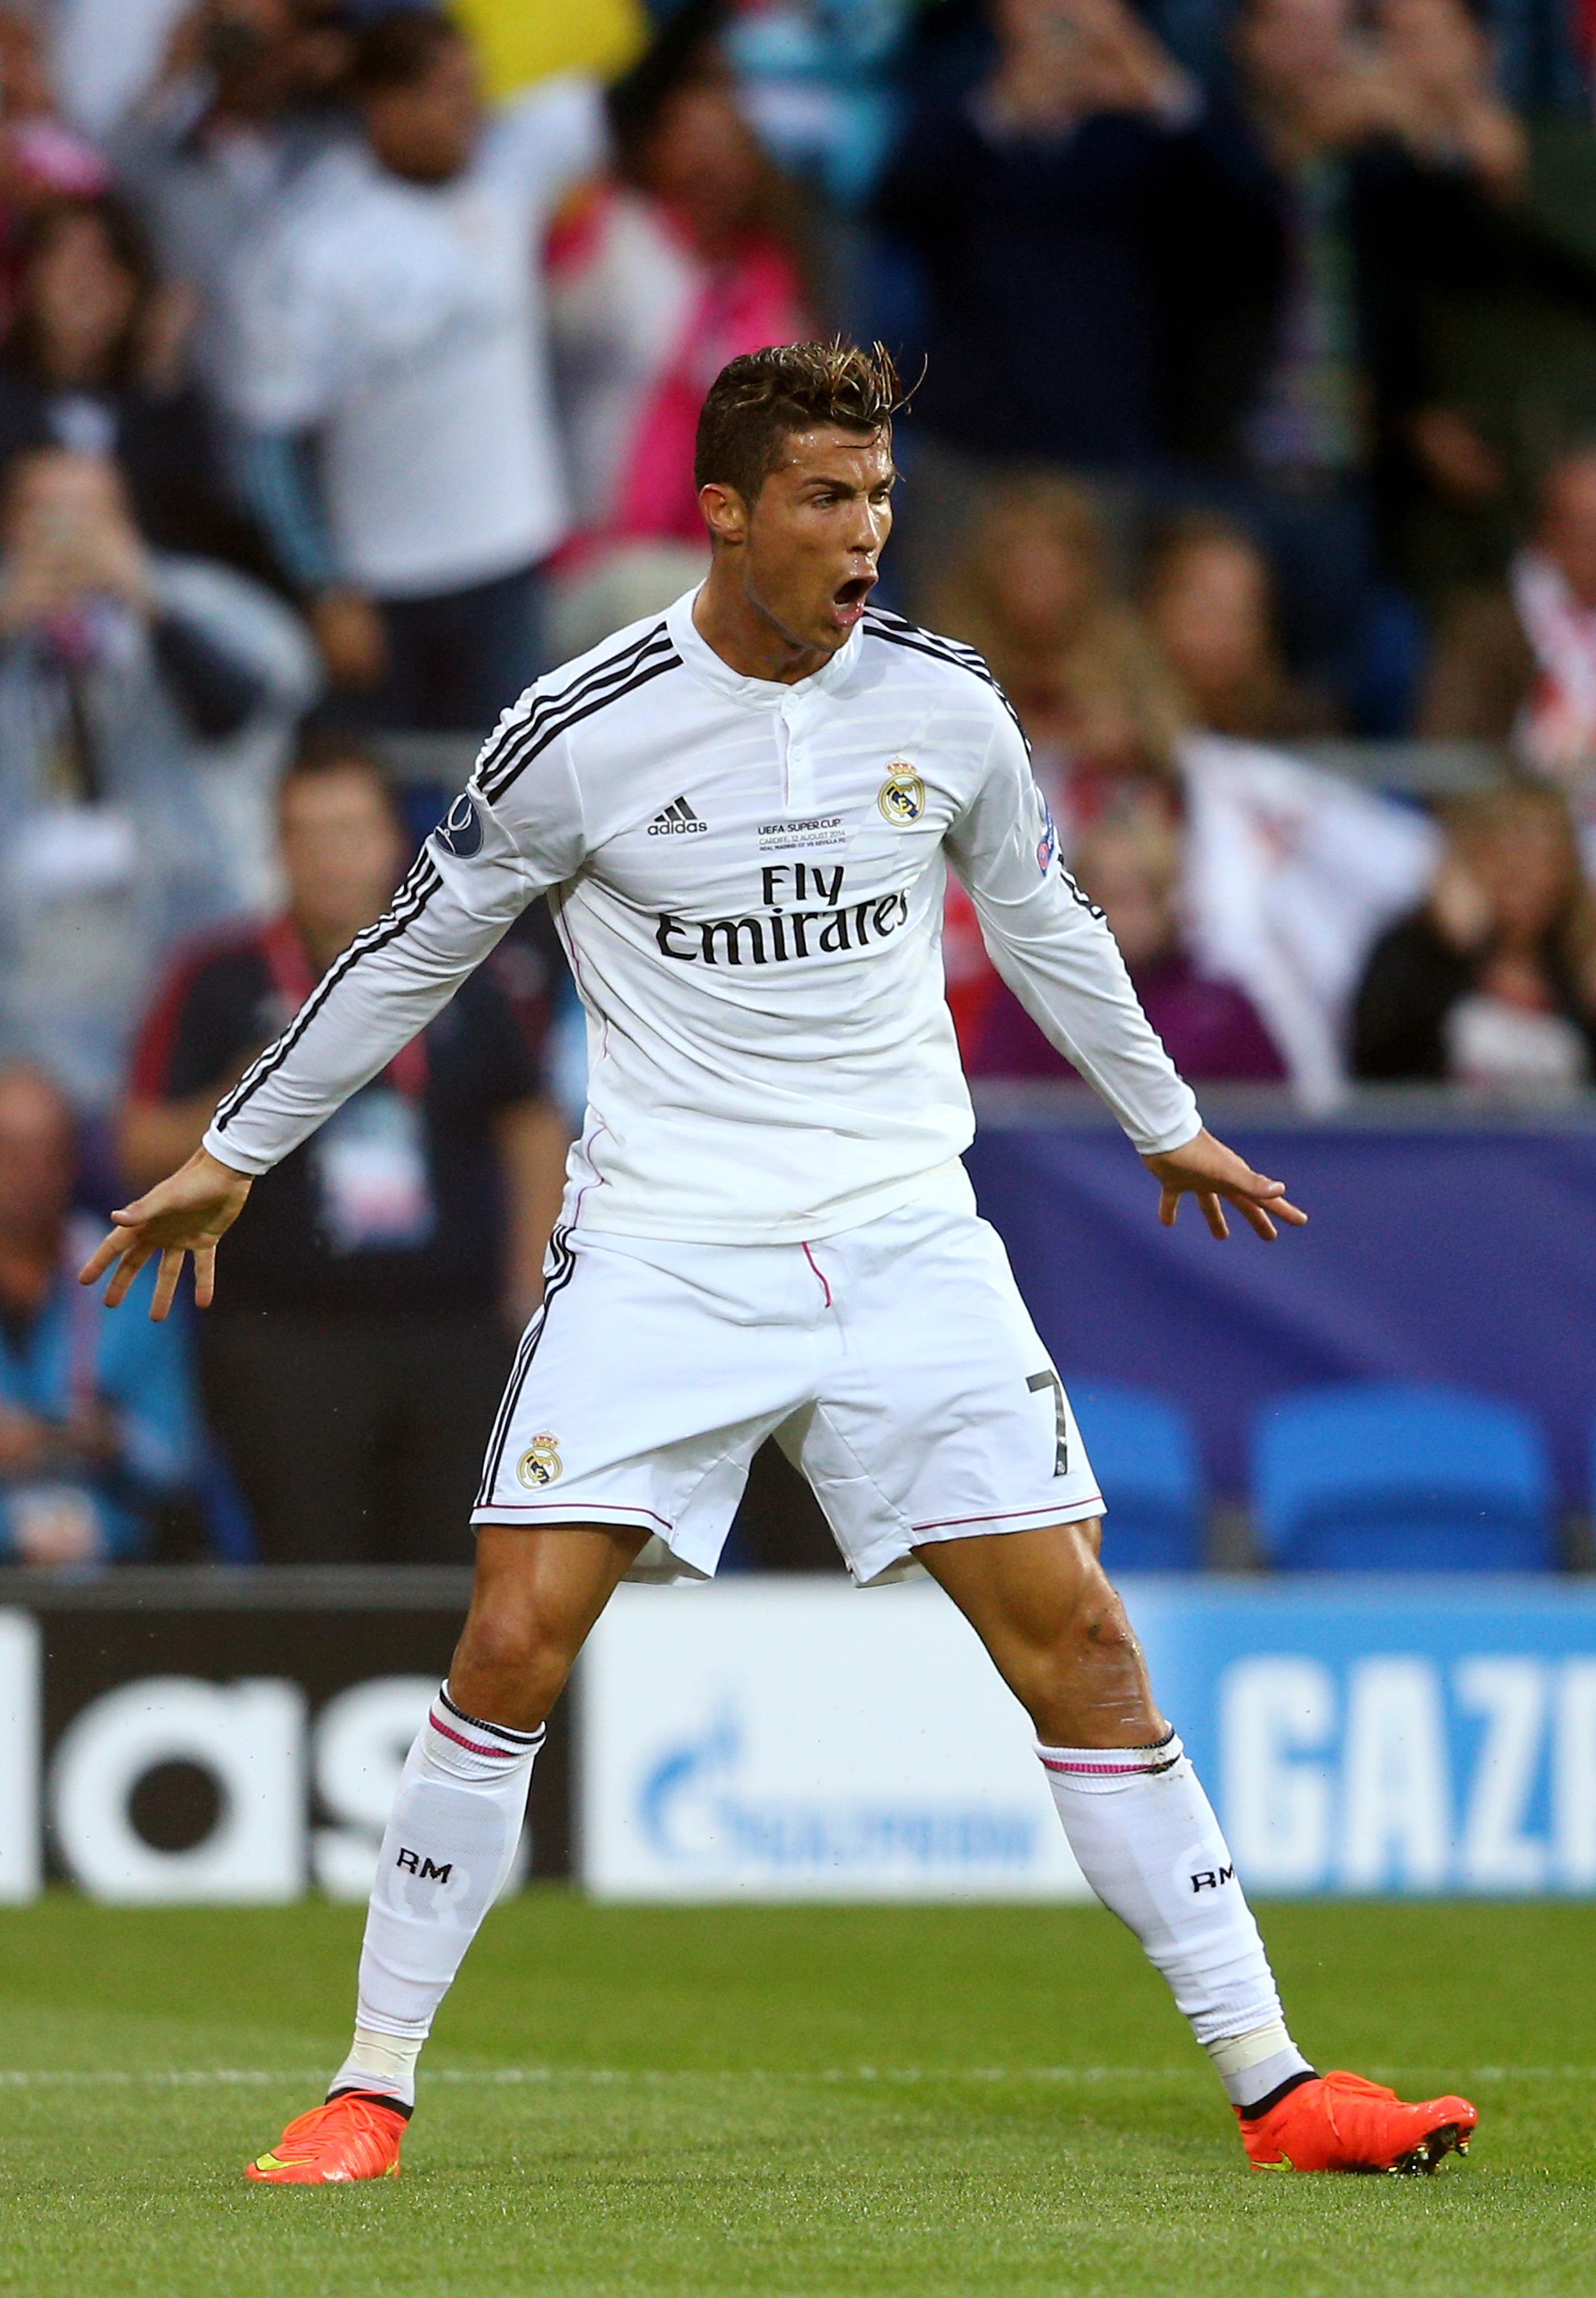 Real Madrid vs. Sevilla, 2014 UEFA Super Cup: Final score 2-0, Ronaldo's brace leads Los Blancos over Sevilla